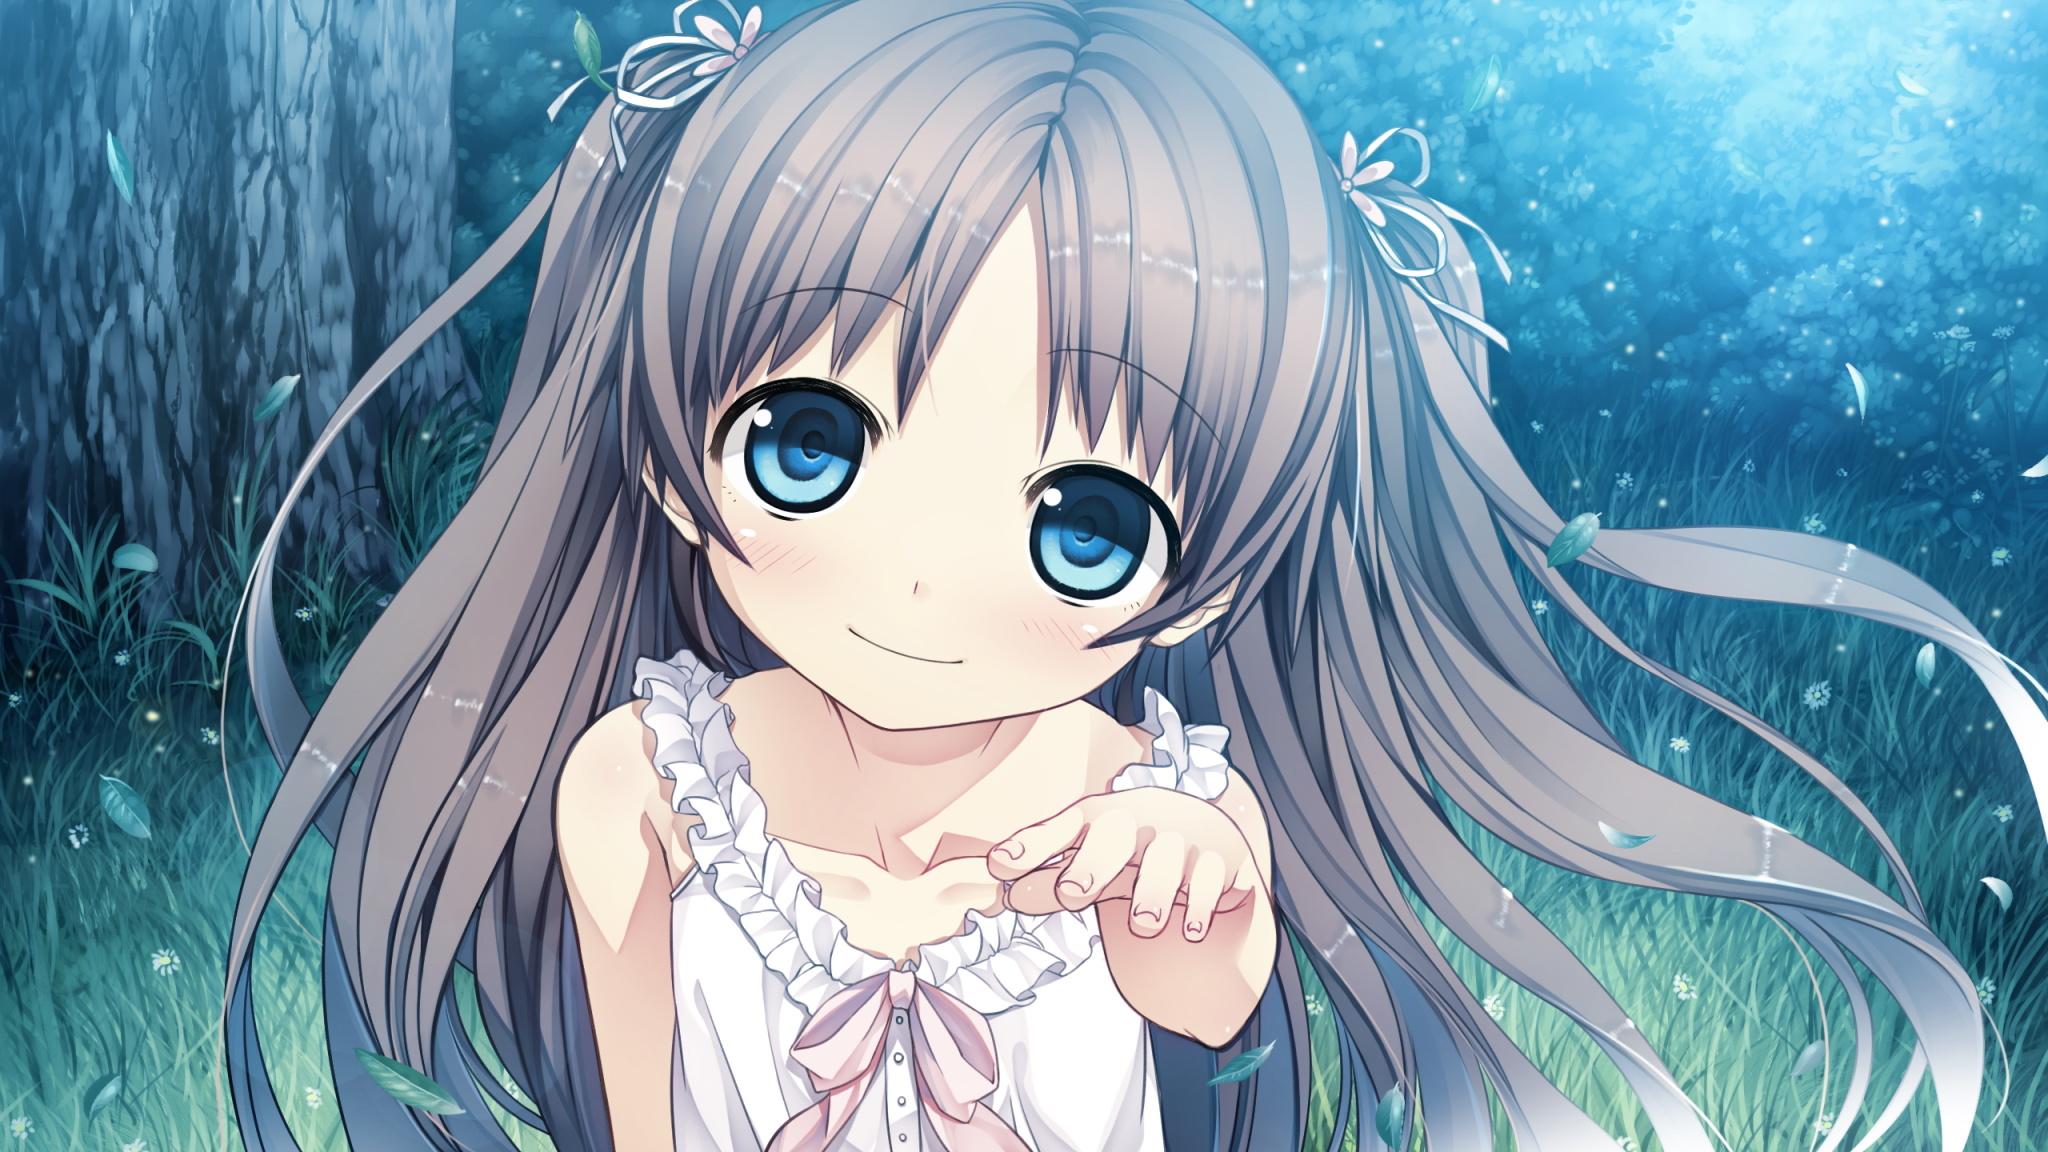 【DMM.R18】FLOWER KNIGHT GIRL 〜X指定〜 part2930 [無断転載禁止]©bbspink.com->画像>88枚